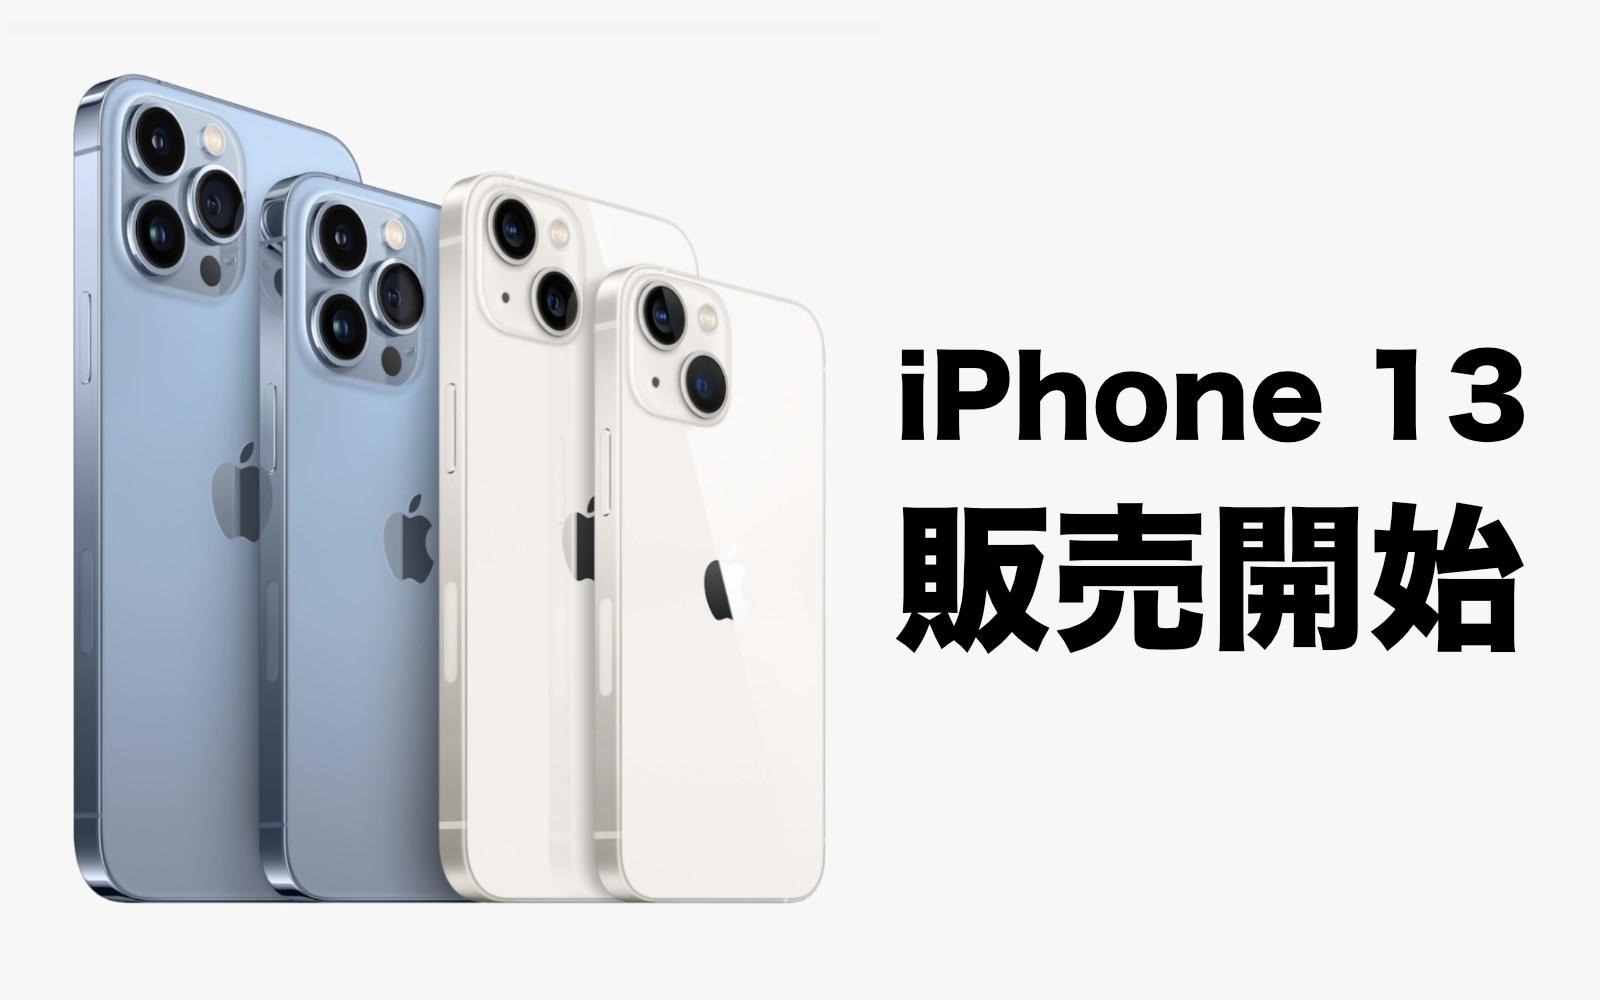 Iphone 13 on sale